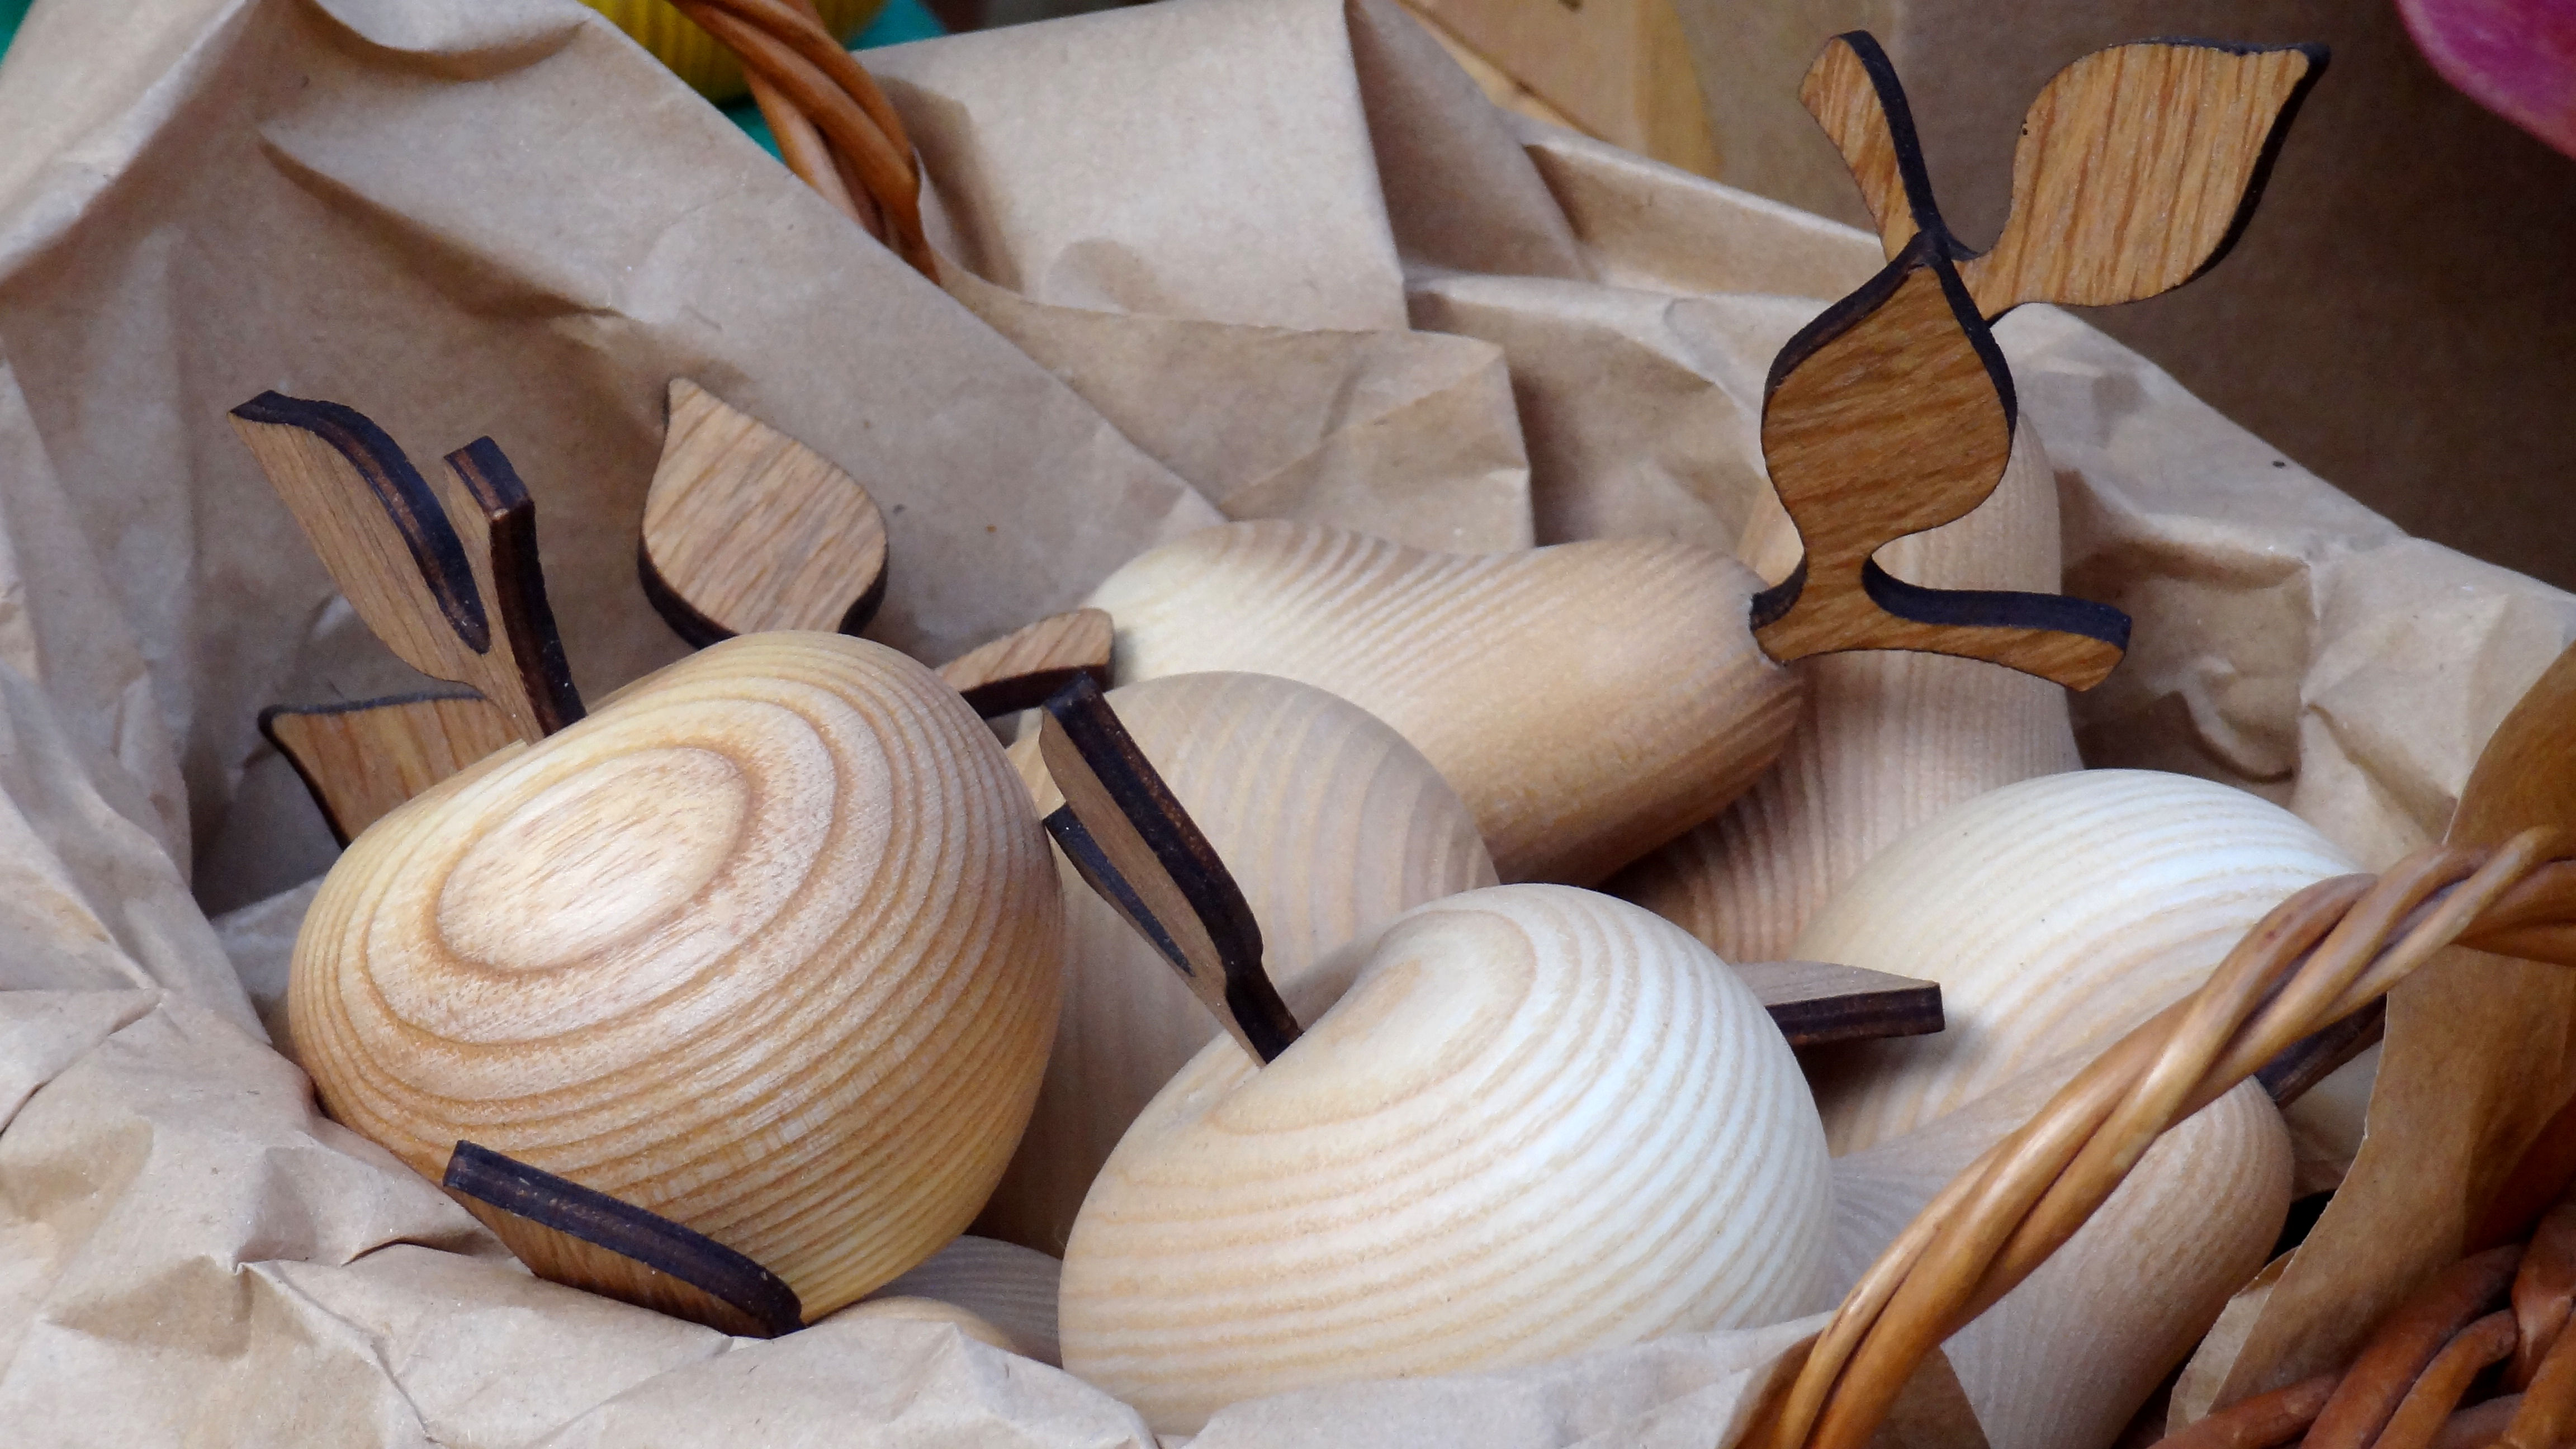 Kartoffelernte by http://babyrockmyday.com/kartoffelernte/